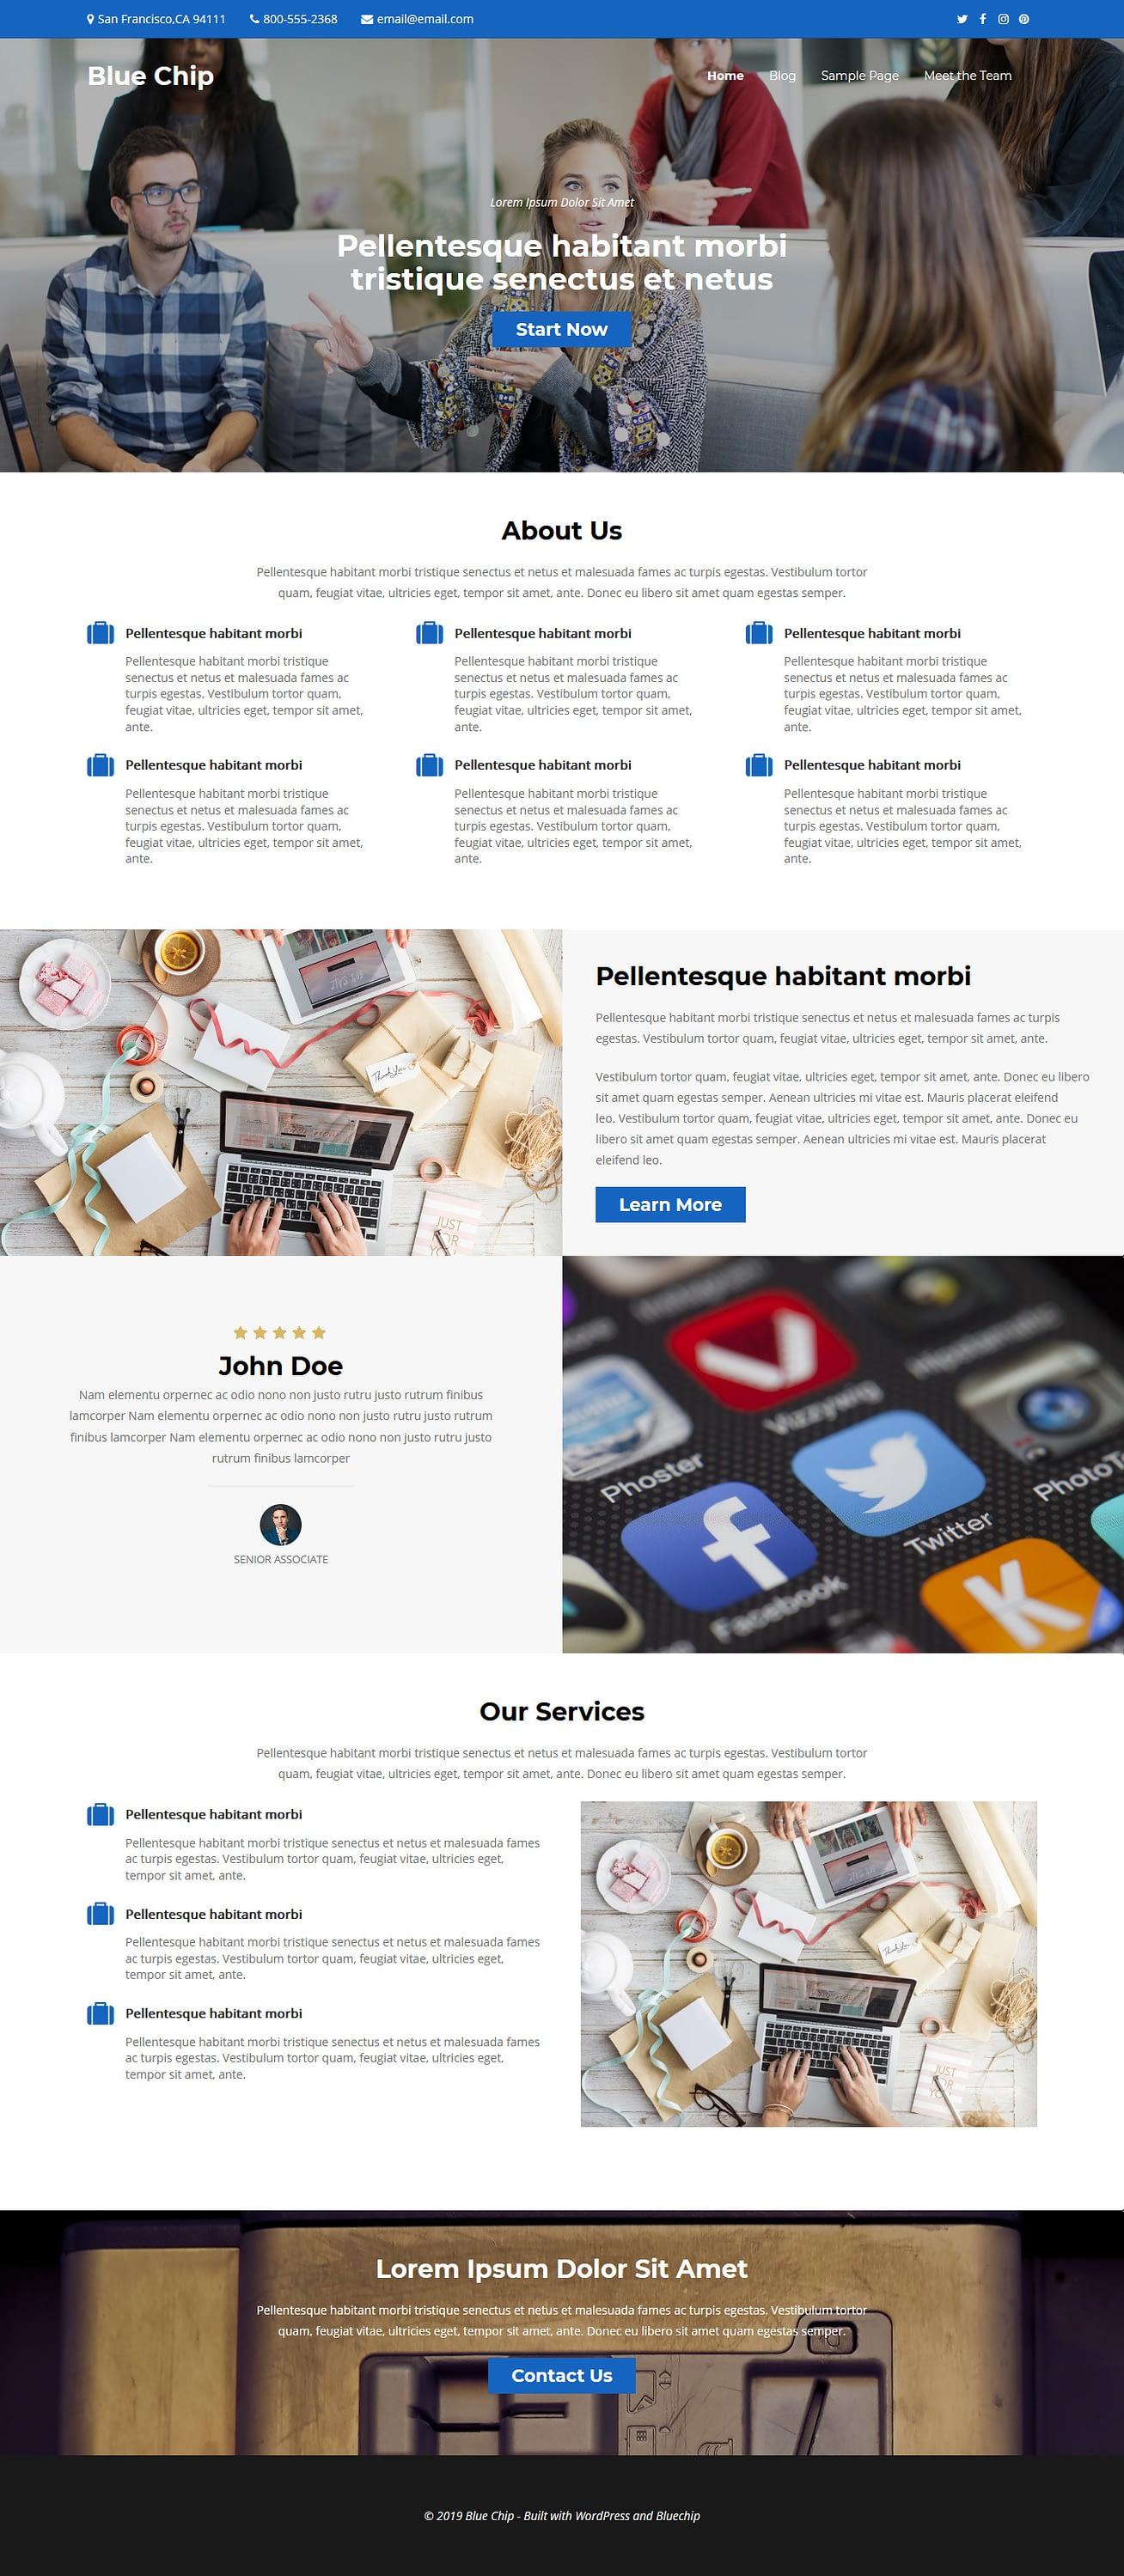 bluechip best free accounting wordpress theme - 10+ Best Free Accounting WordPress Themes